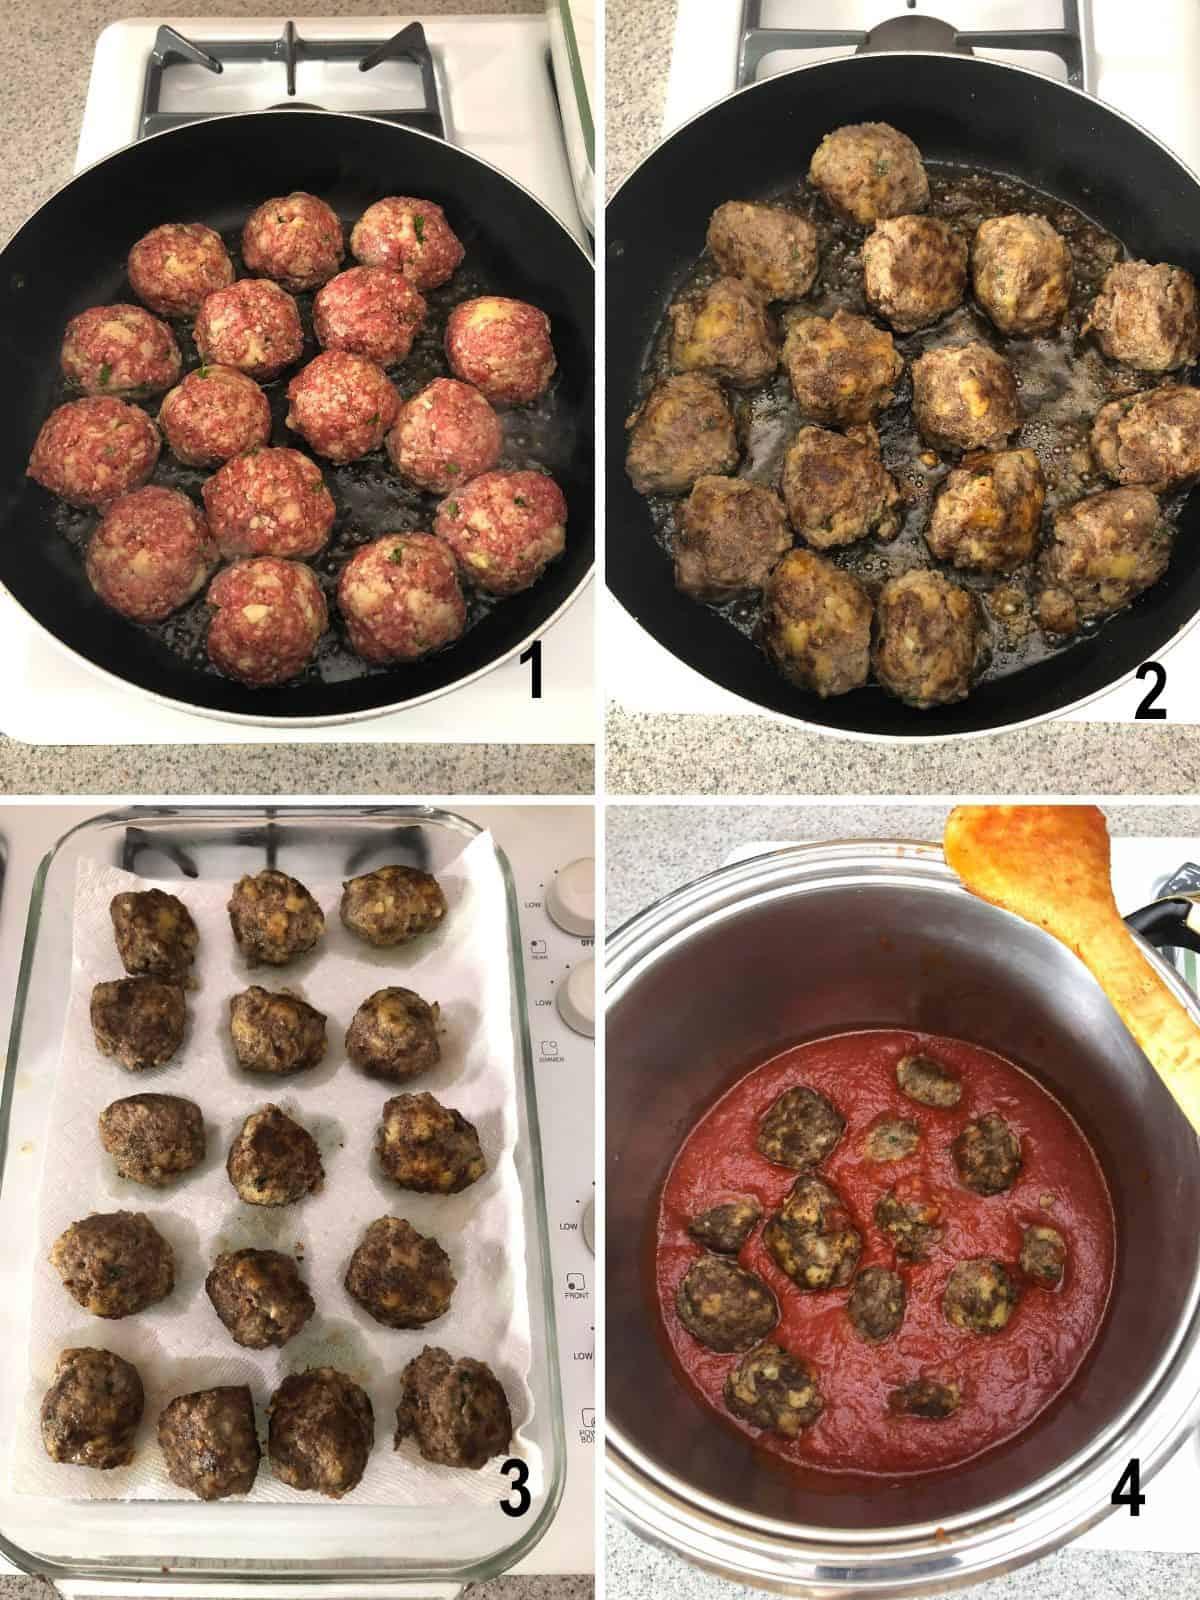 frying meatballs in pan, browned meatballs on paper towels, cooking meatballs in sauce